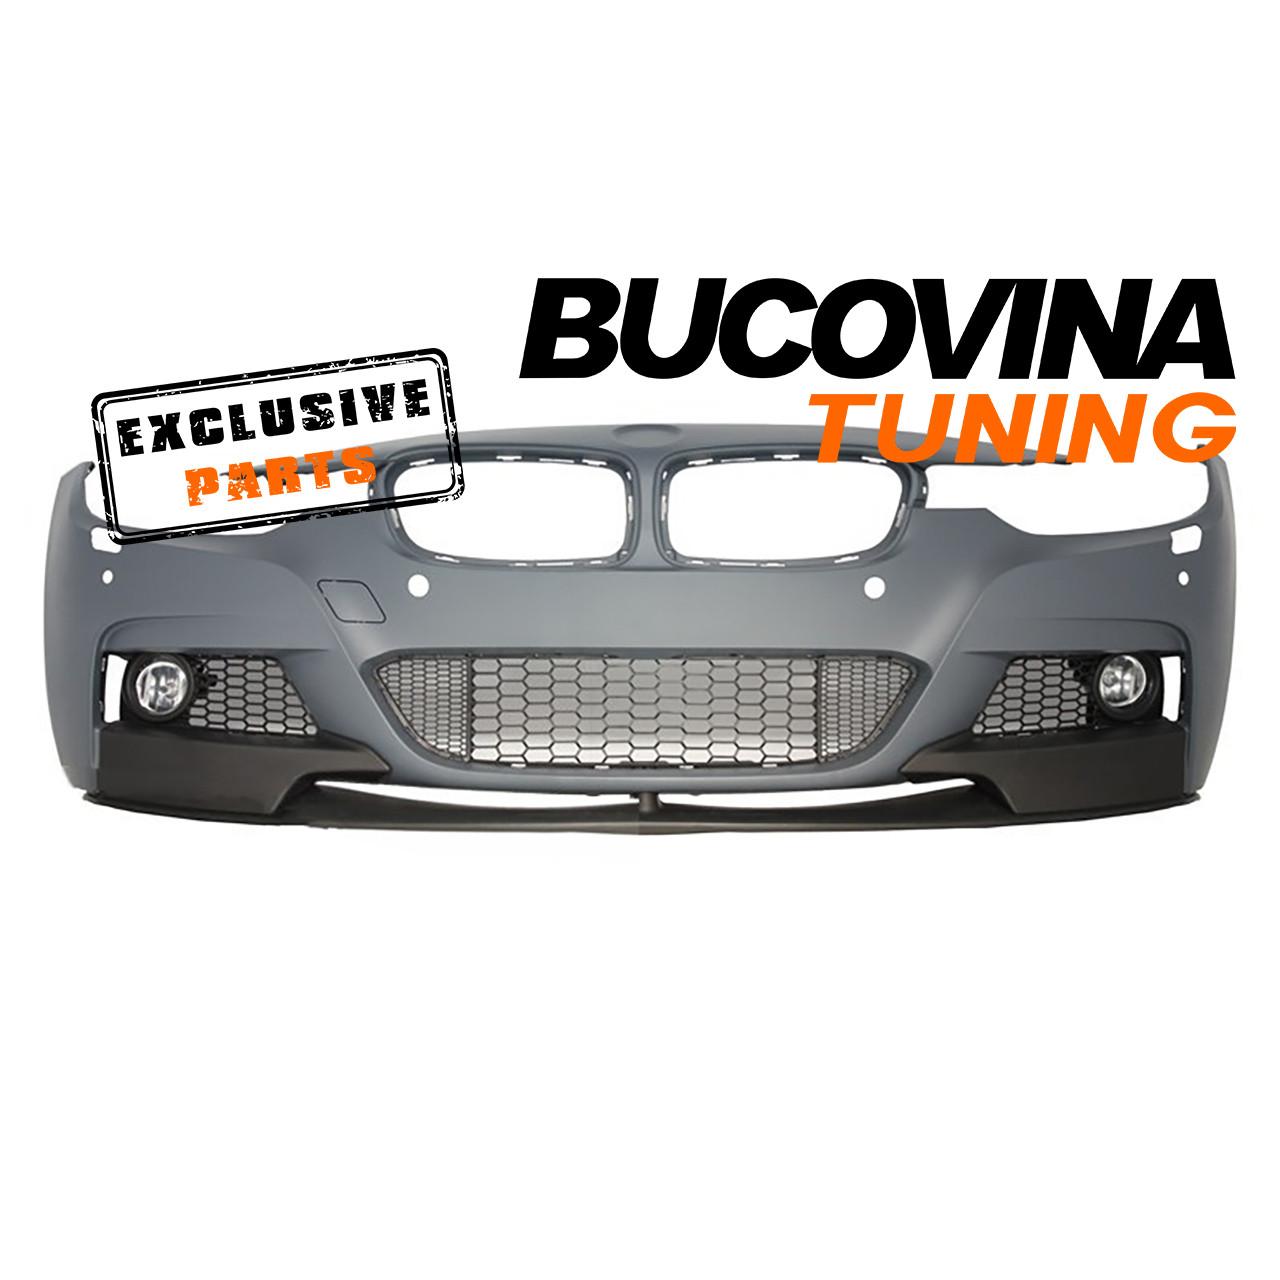 BARA FATA BMW SERIA 3 F30/F31 (11-18) M-PERFORMANCE DESIGN